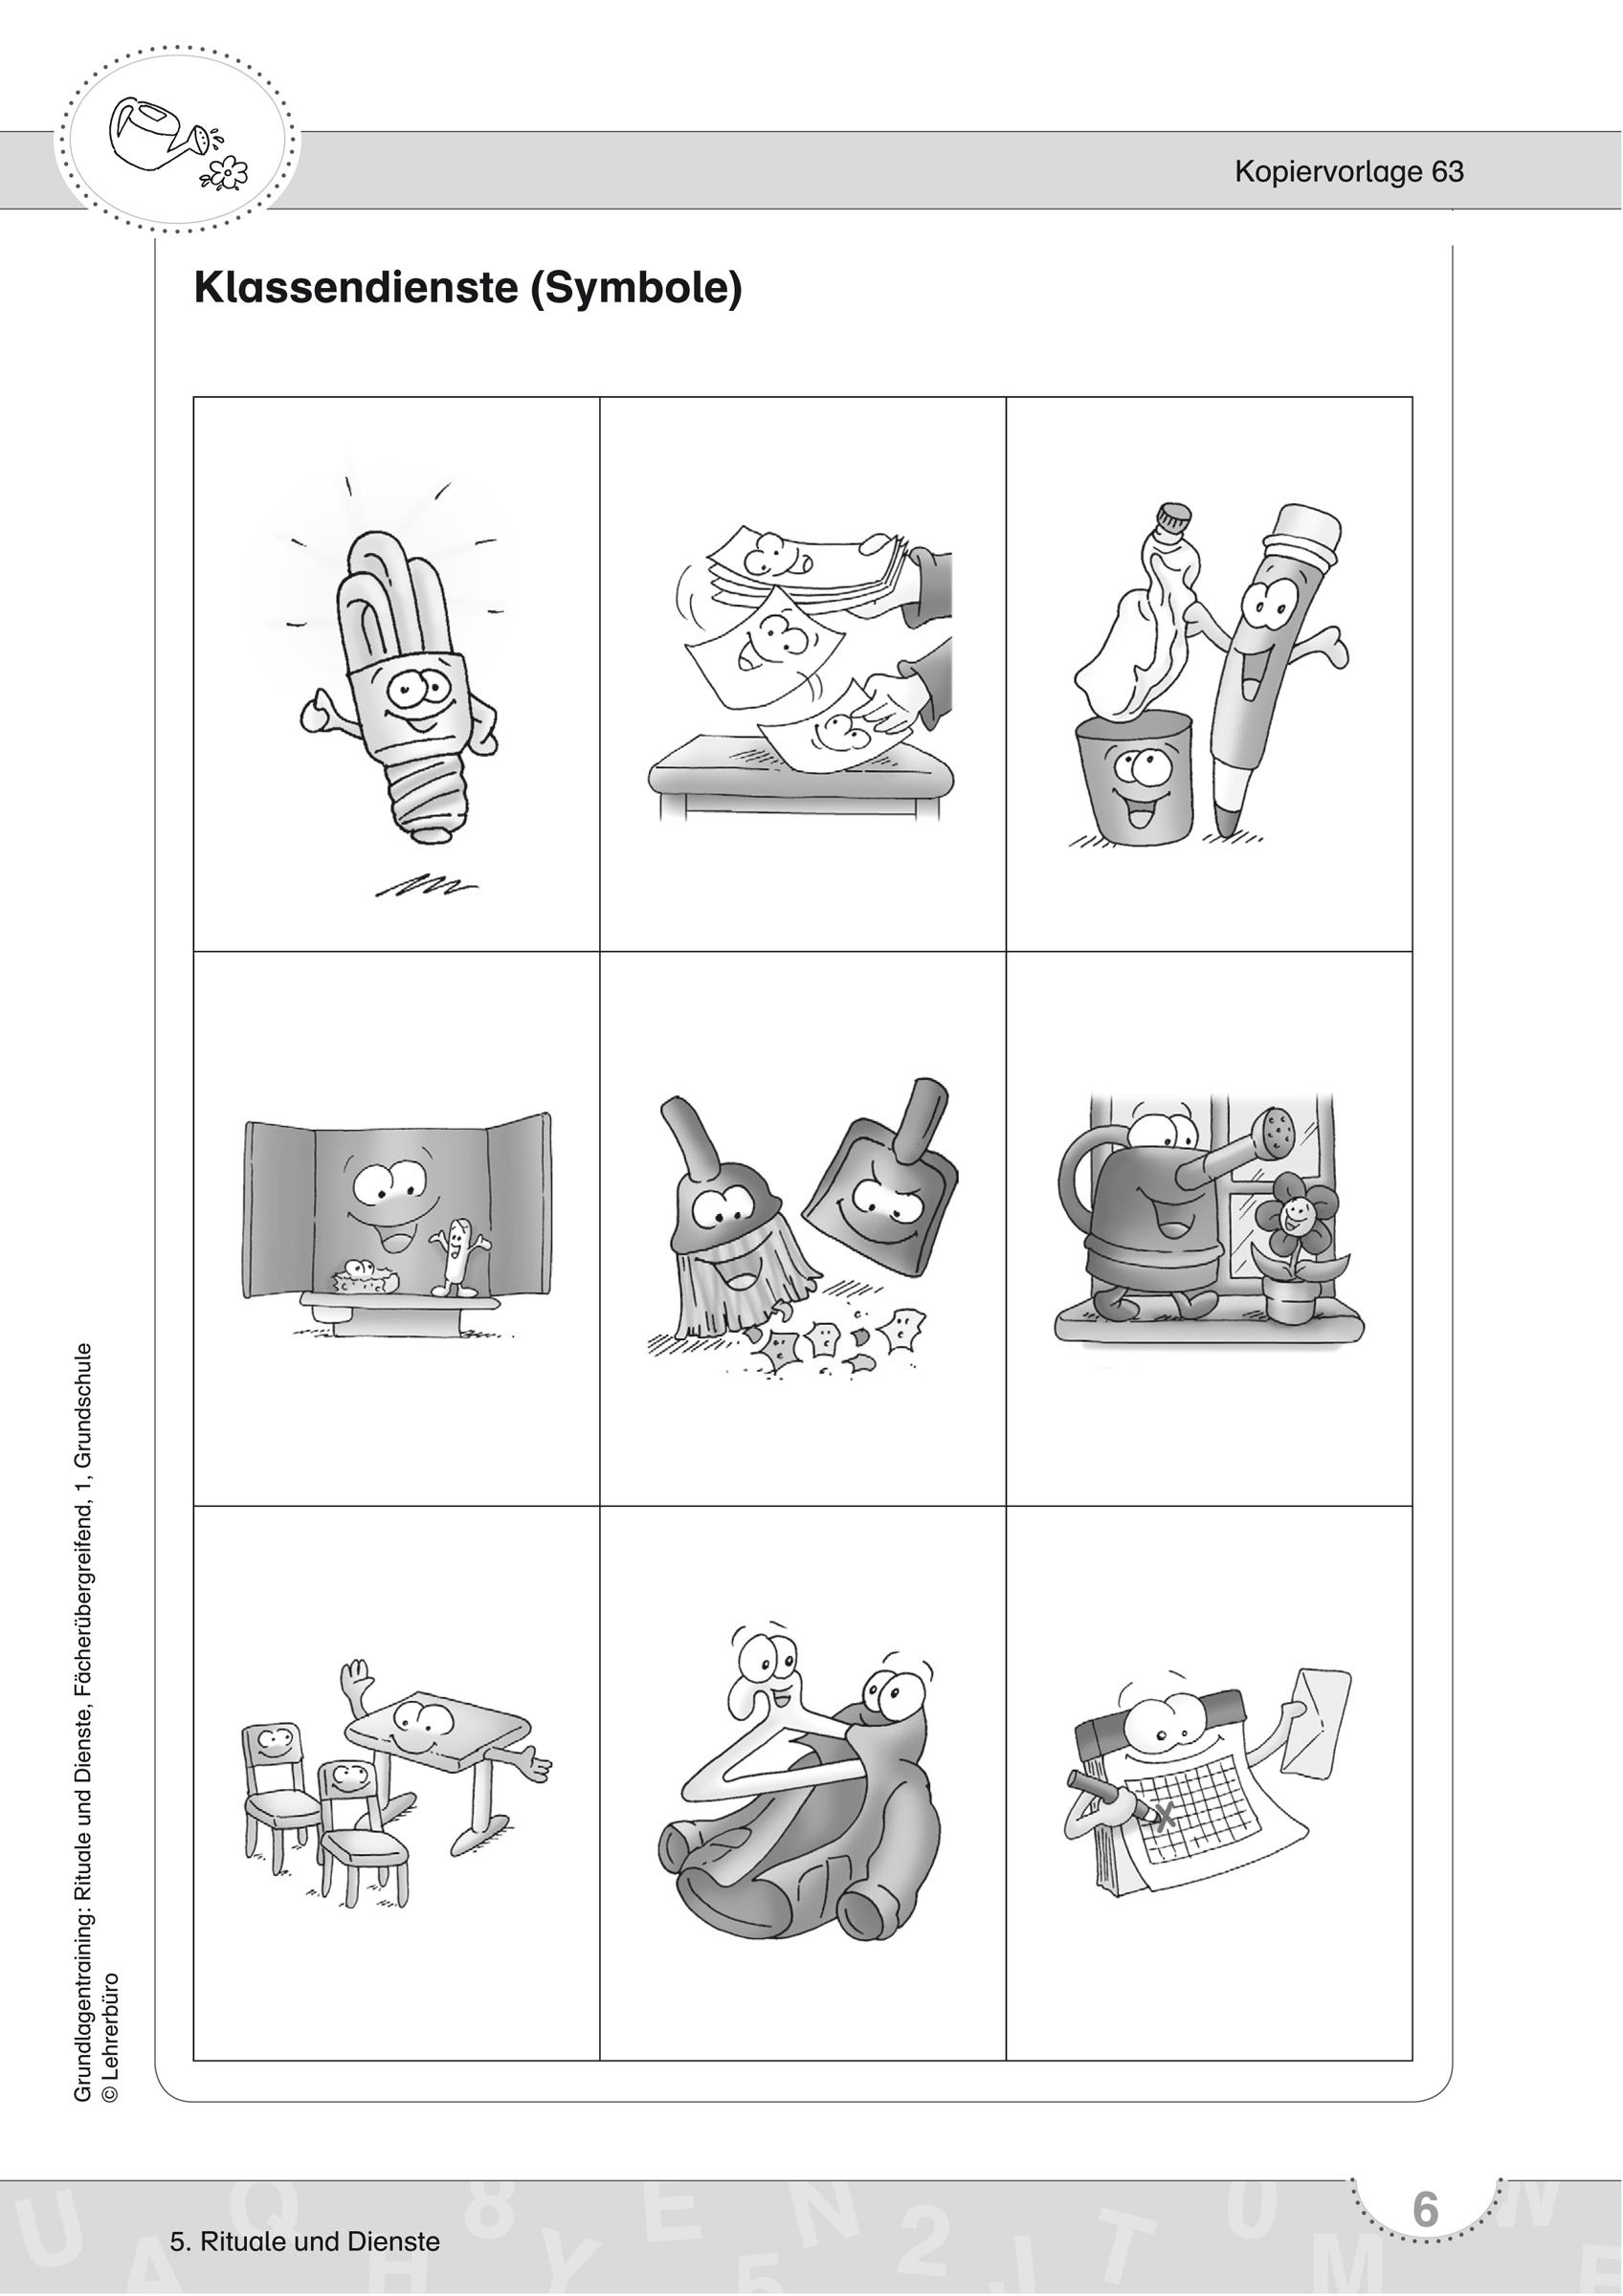 Grundschule Unterrichtsmaterial mit Klassendienste Kopiervorlage